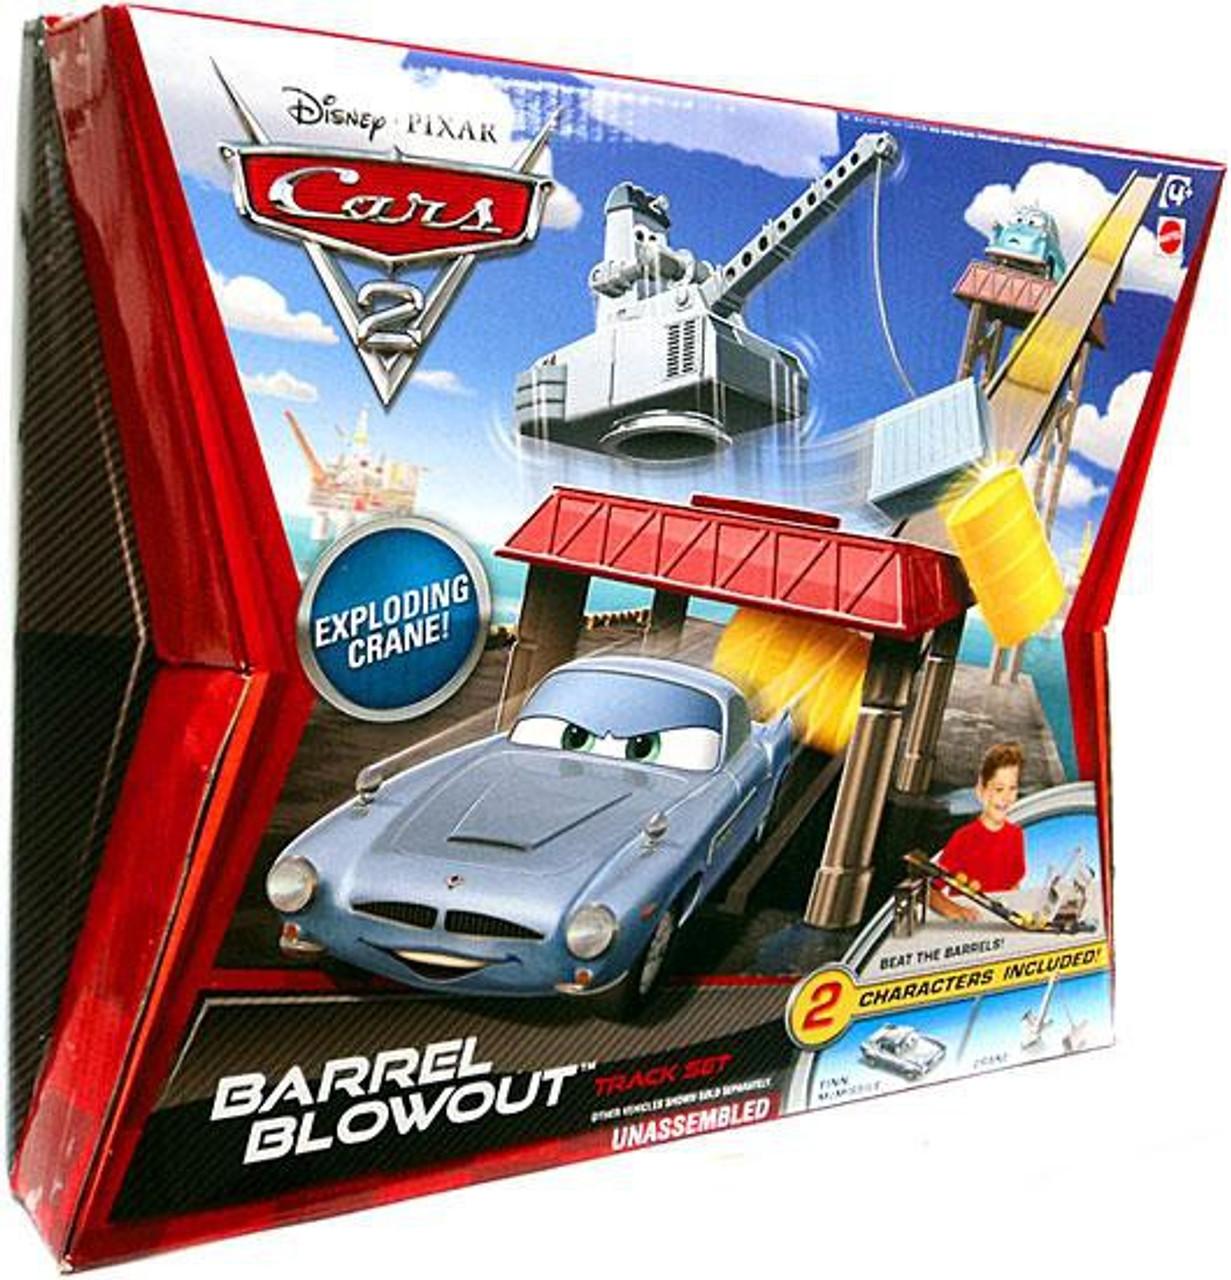 Disney Pixar Cars Cars 2 Playsets Barrel Blowout Diecast Car Track